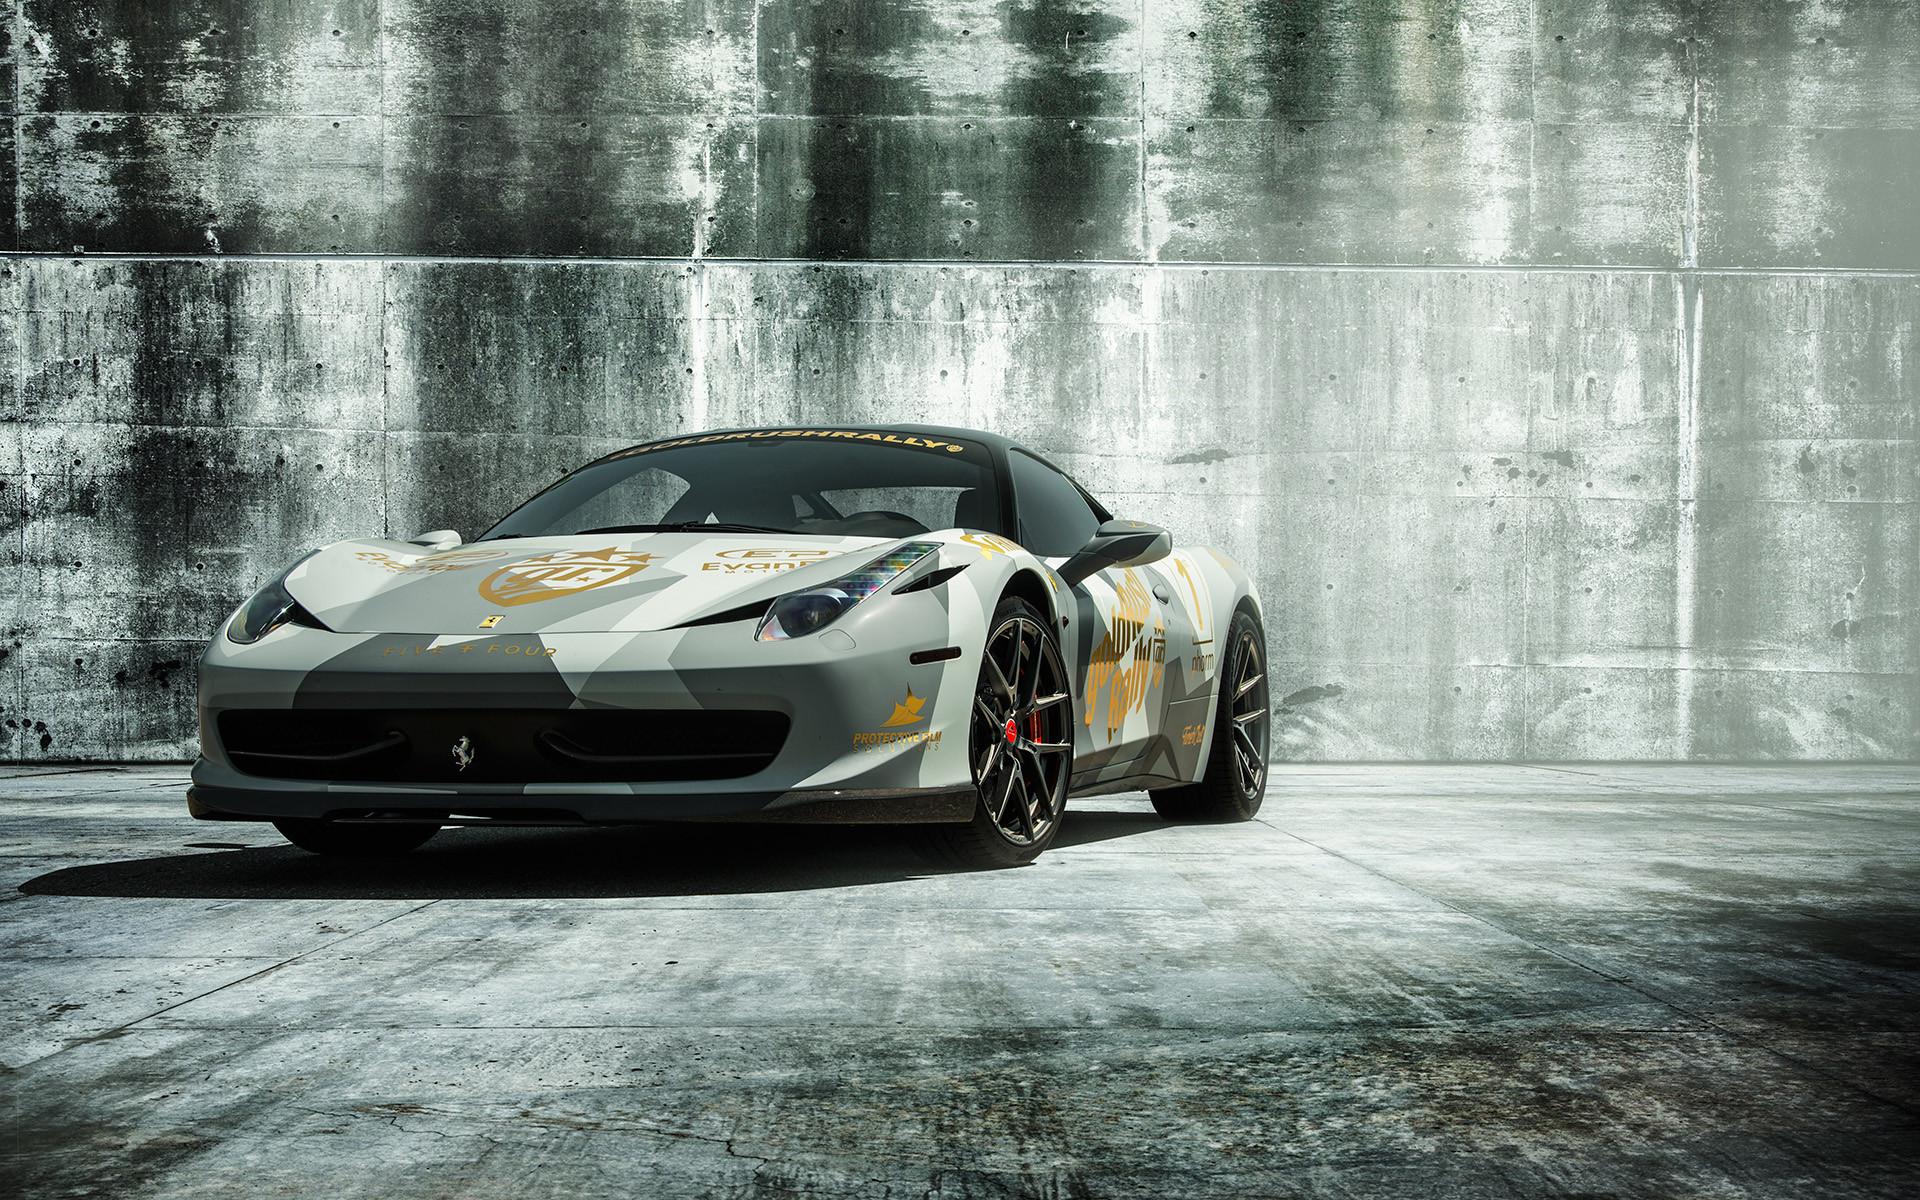 2018 Ferrari 458 Italia Wallpaper 1